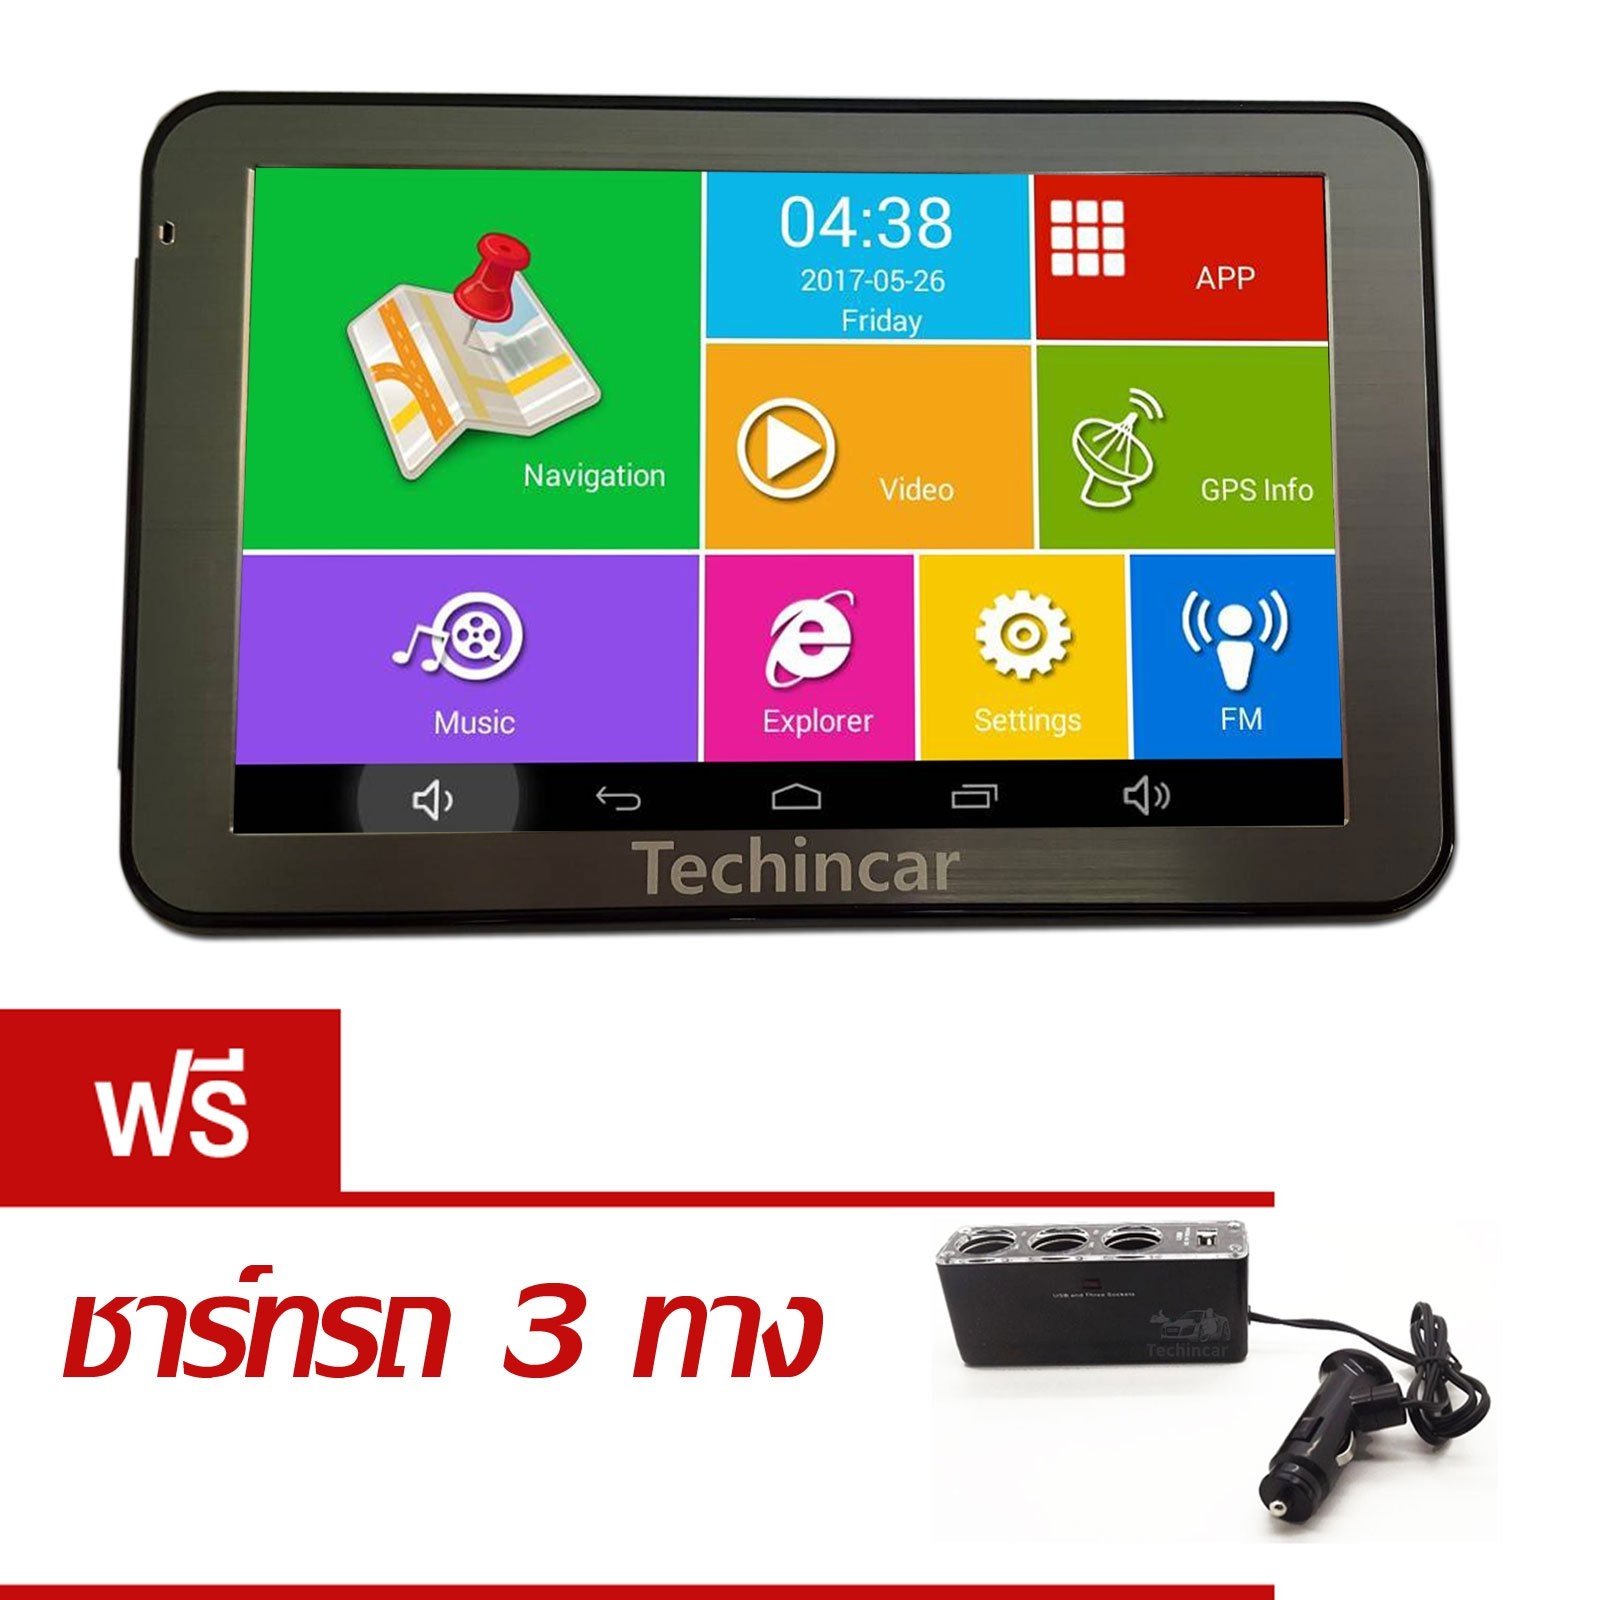 "GPSนำทาง Android จอ 5.0"" รุ่น M515 (ขนาดหน้าจอ 5.0"") ROM 8GB + Bluetooth+wifi+AV-IN (สีดำ)"